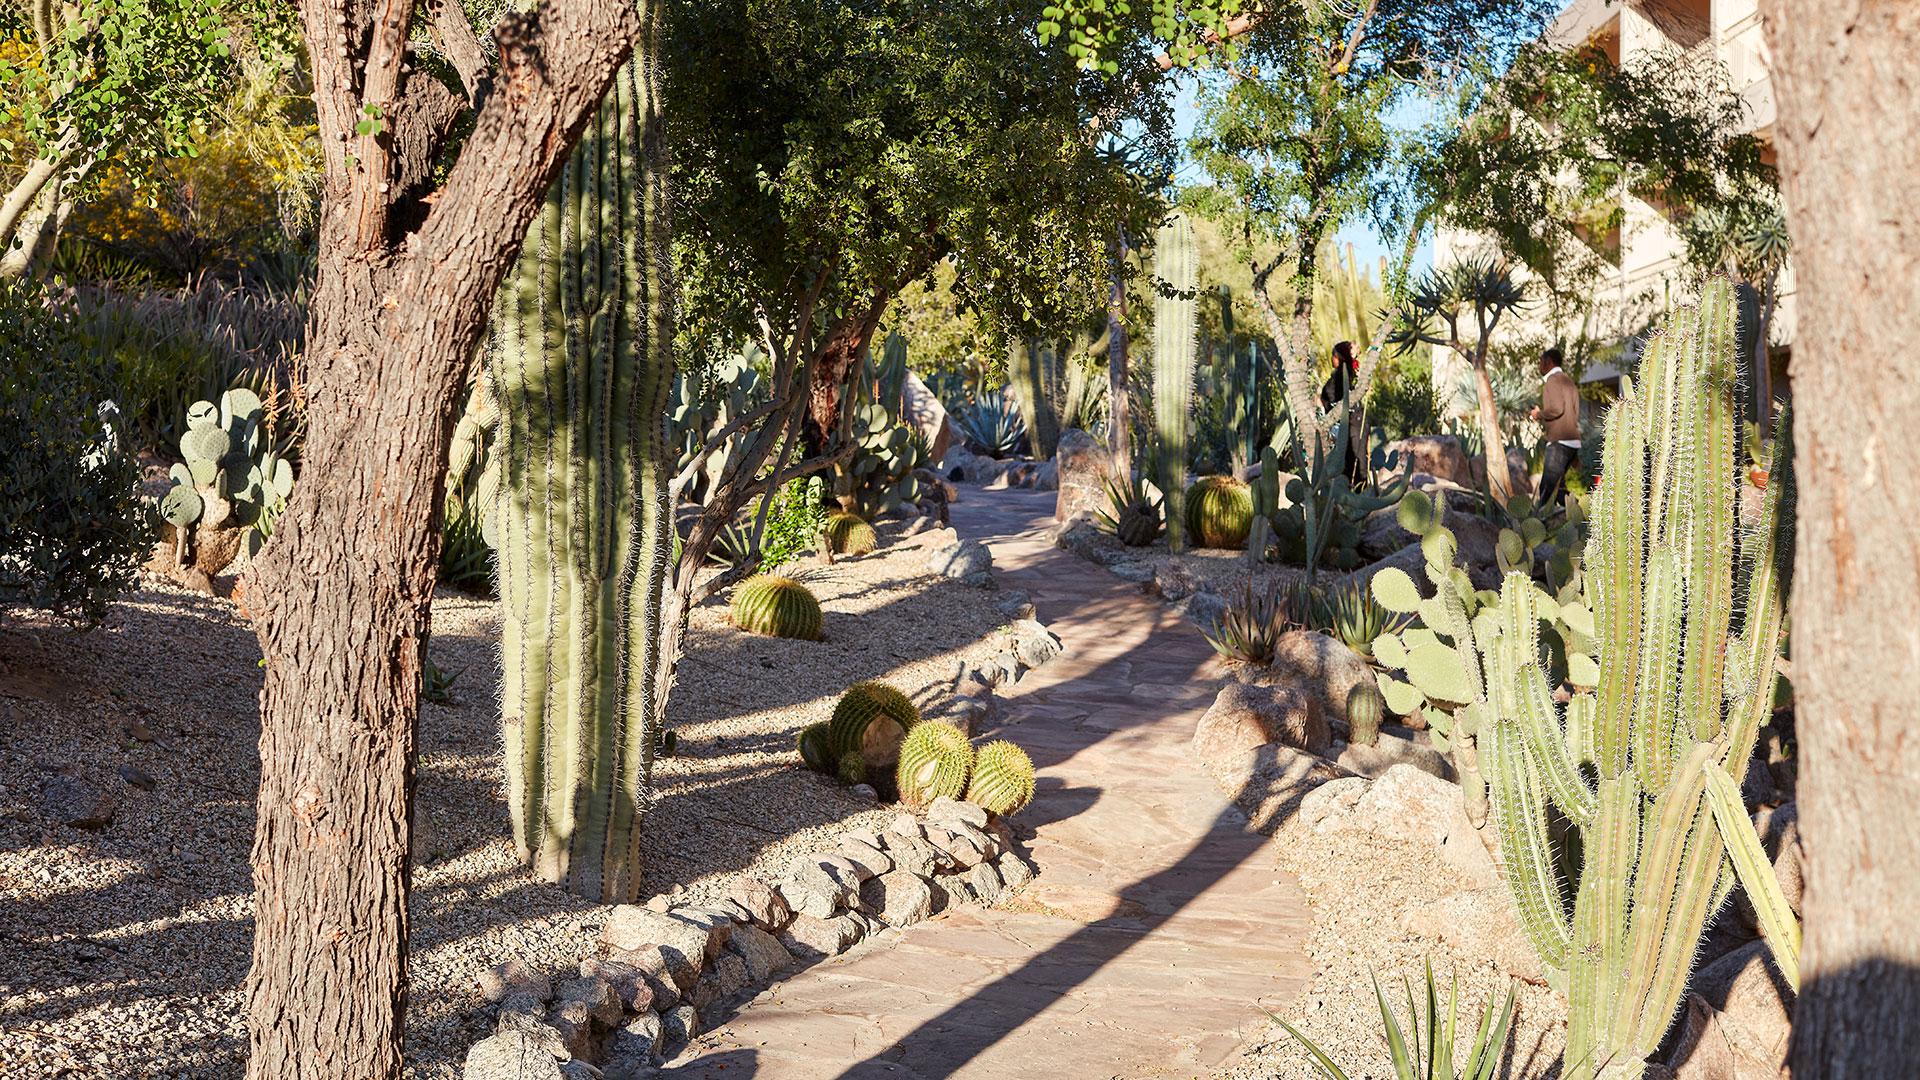 Patios overlook the Cactus Garden and provide views of Camelback Mountain's flora and fauna